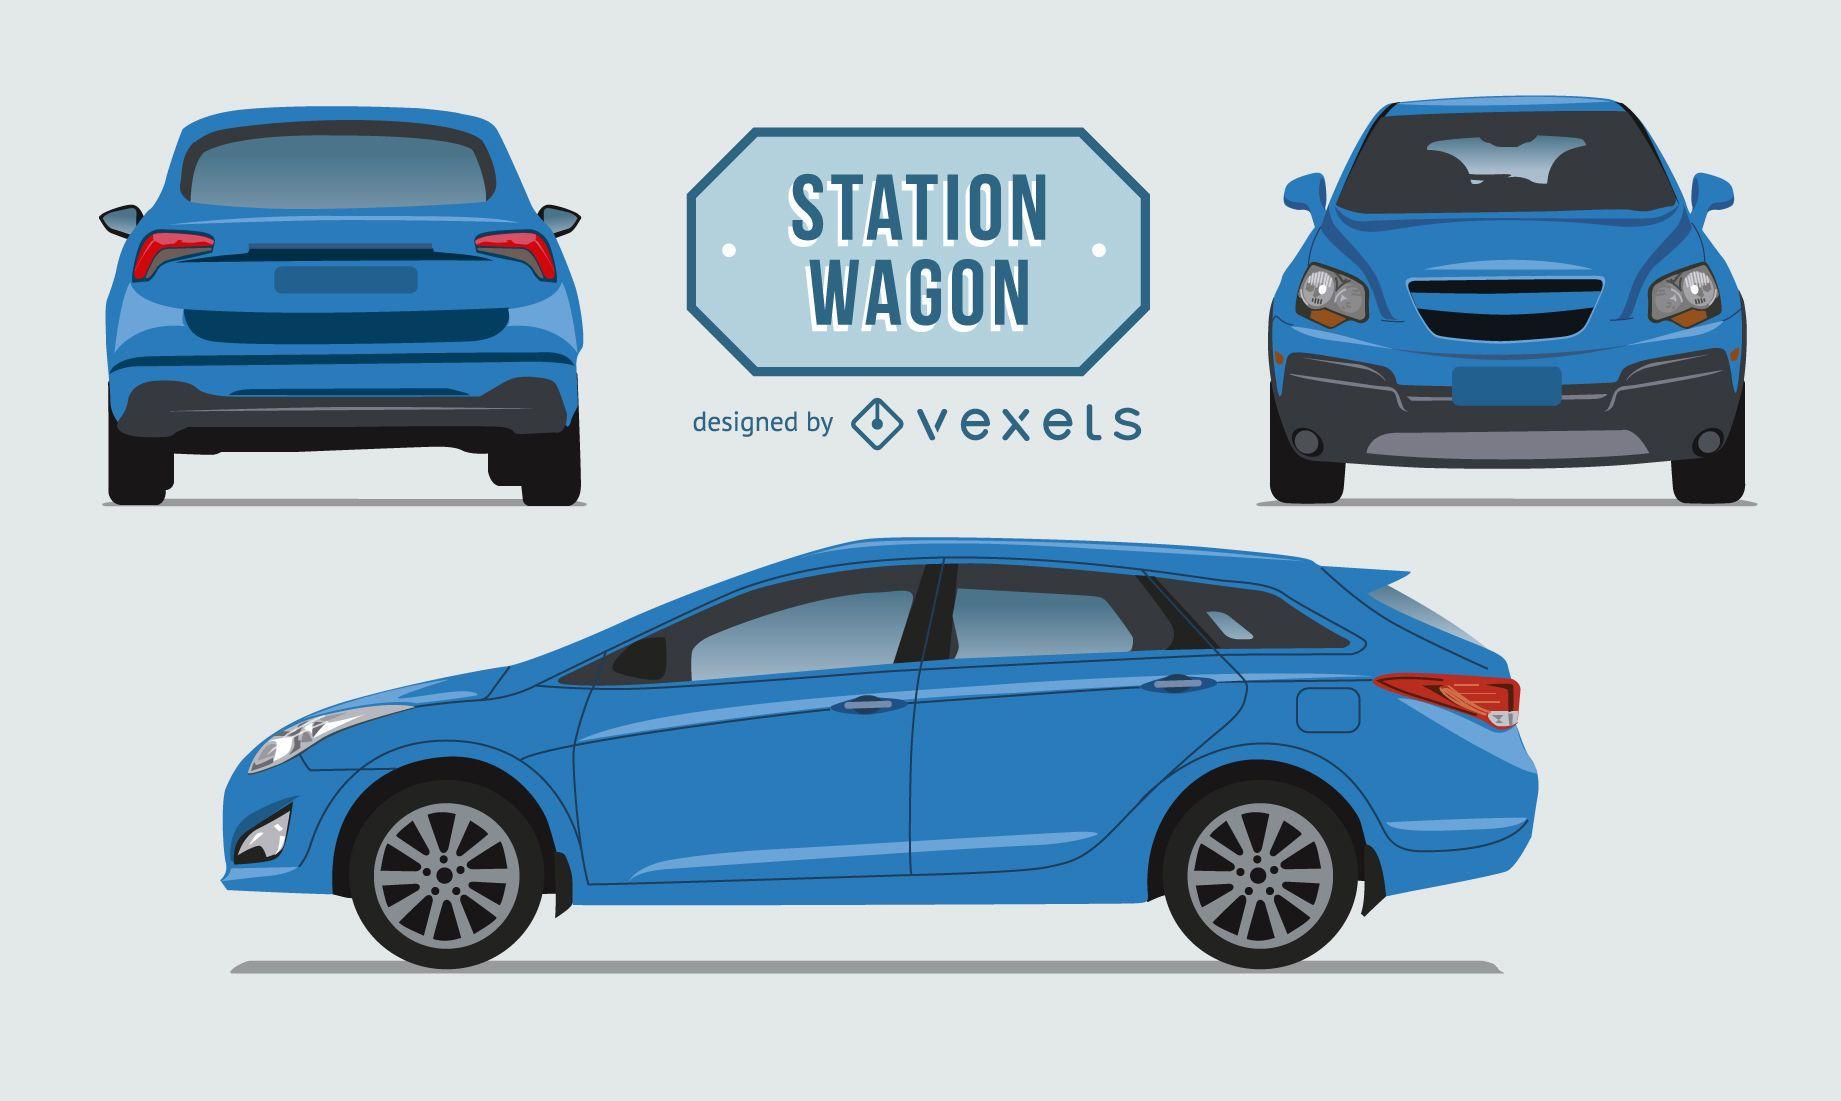 Station Wagon car illustration set